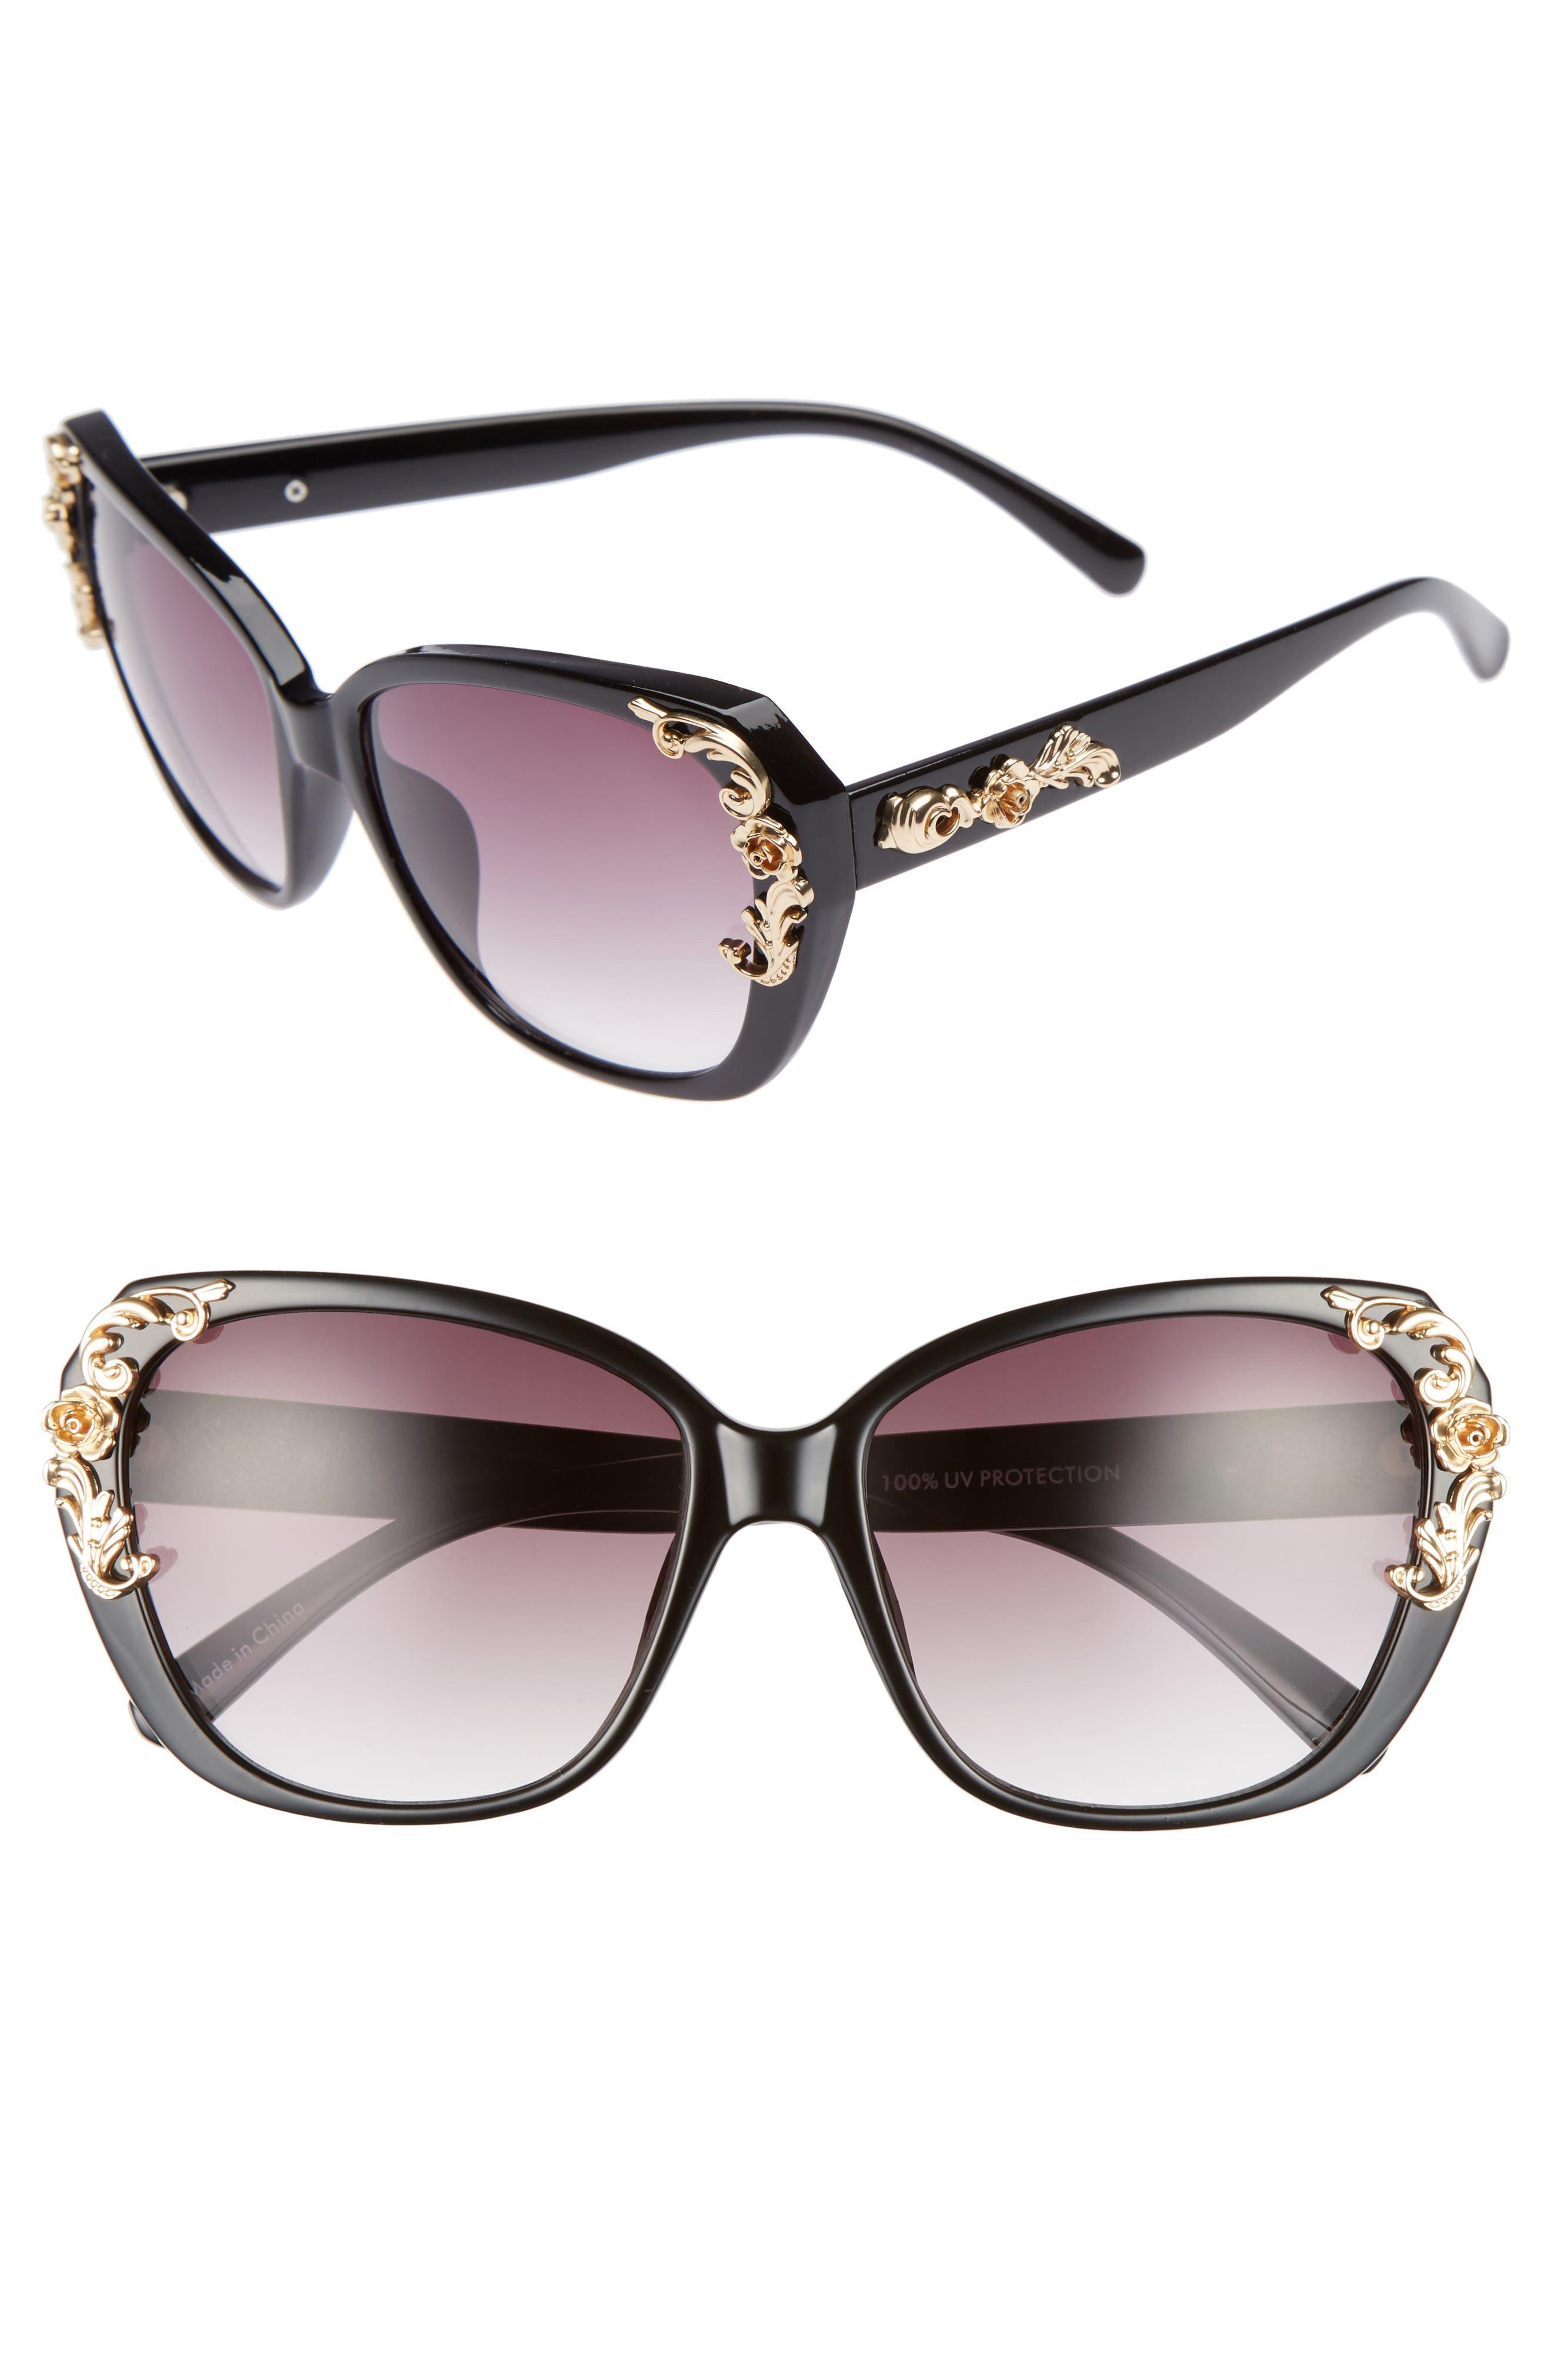 Main Image - Leith 56mm Filigree Embellished Square Sunglasses